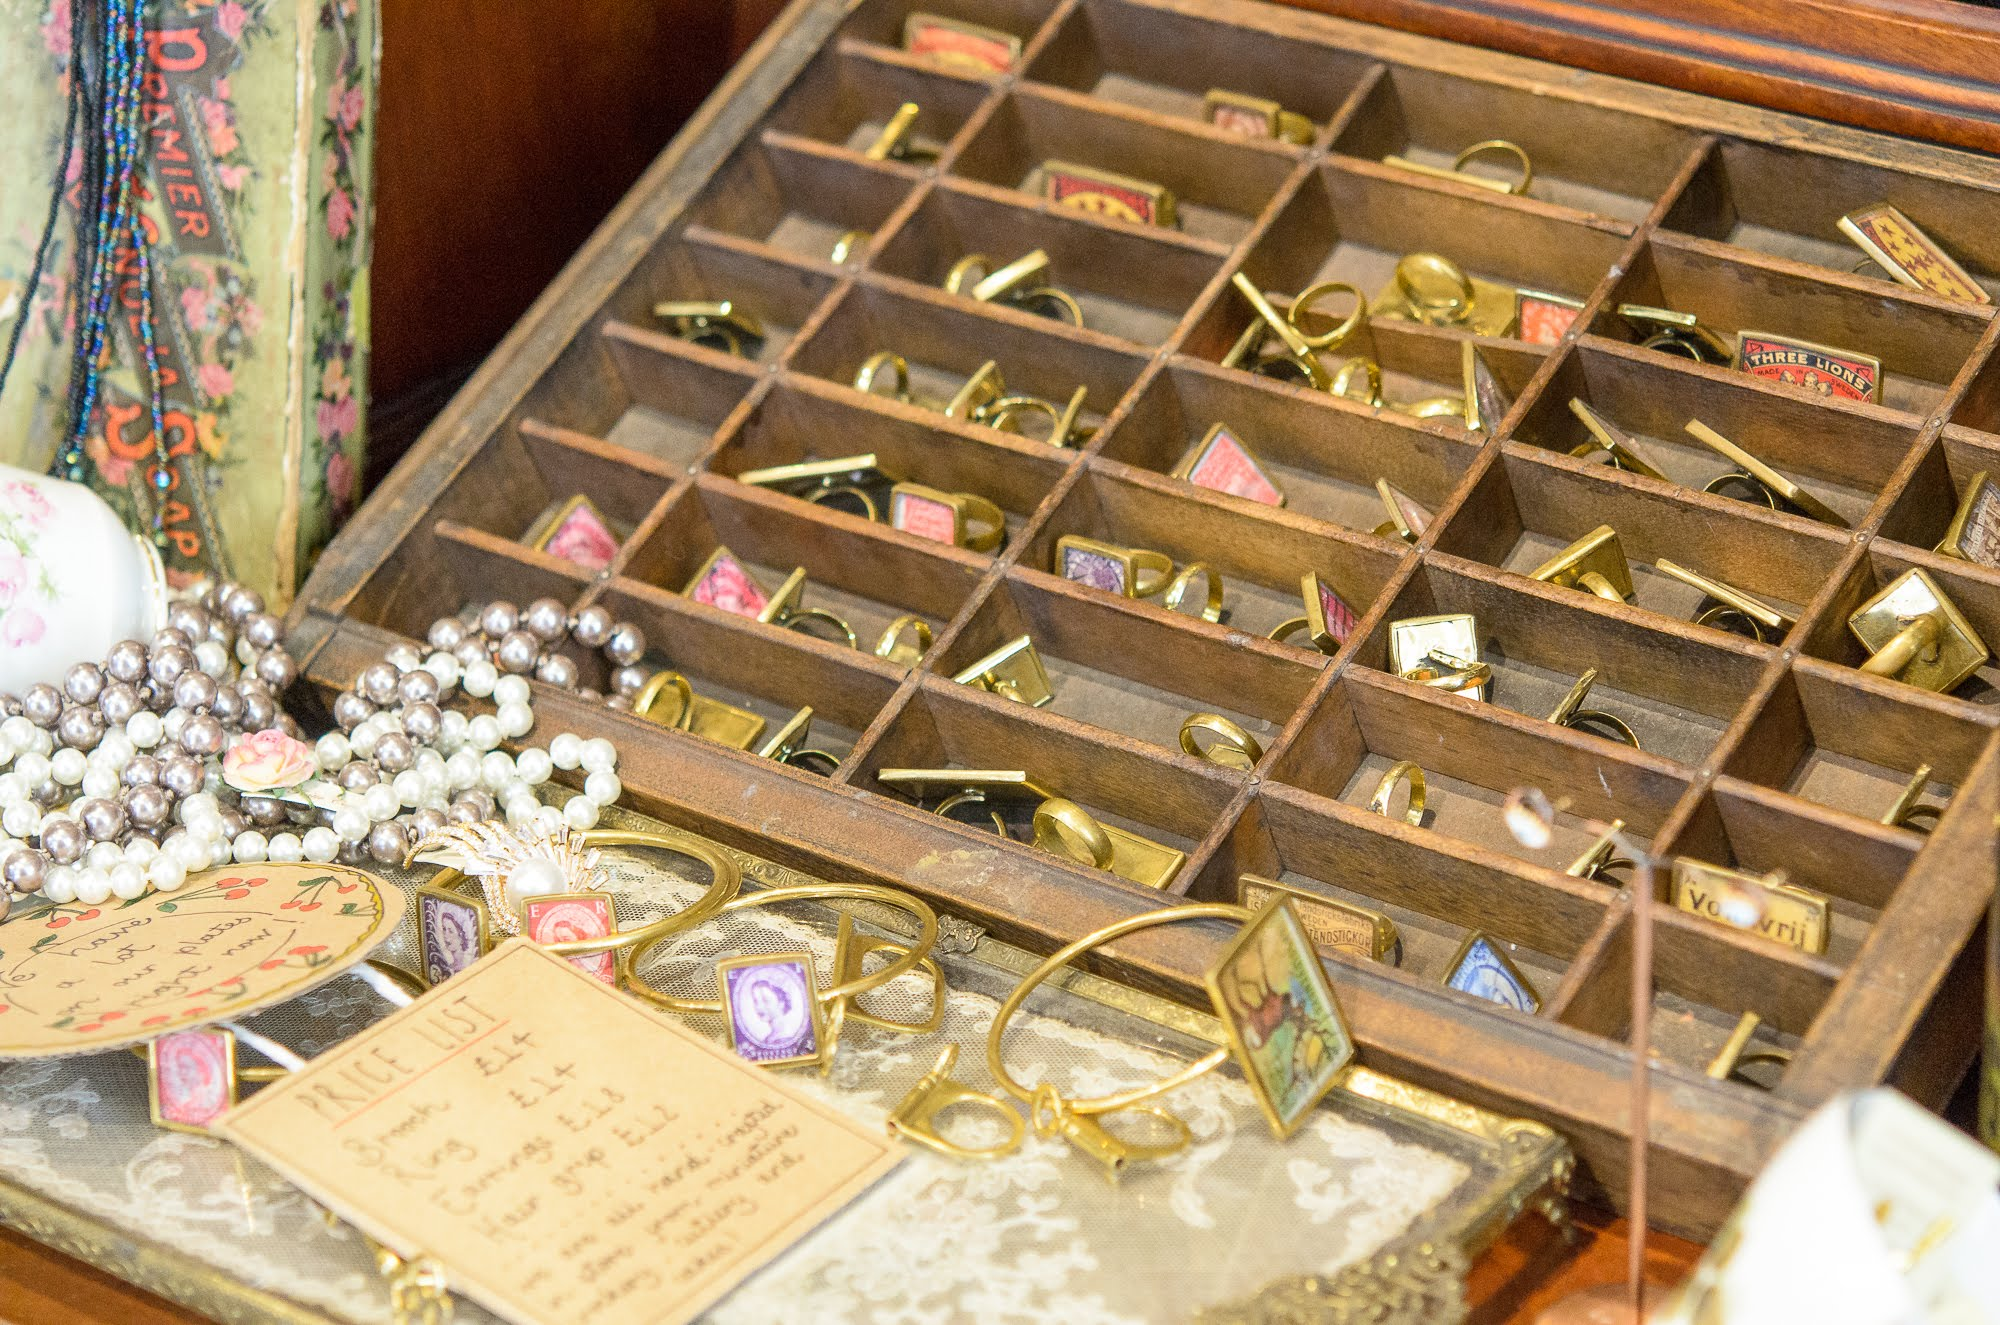 Bespoke and custom jewellery in Miss Katie Cupcake